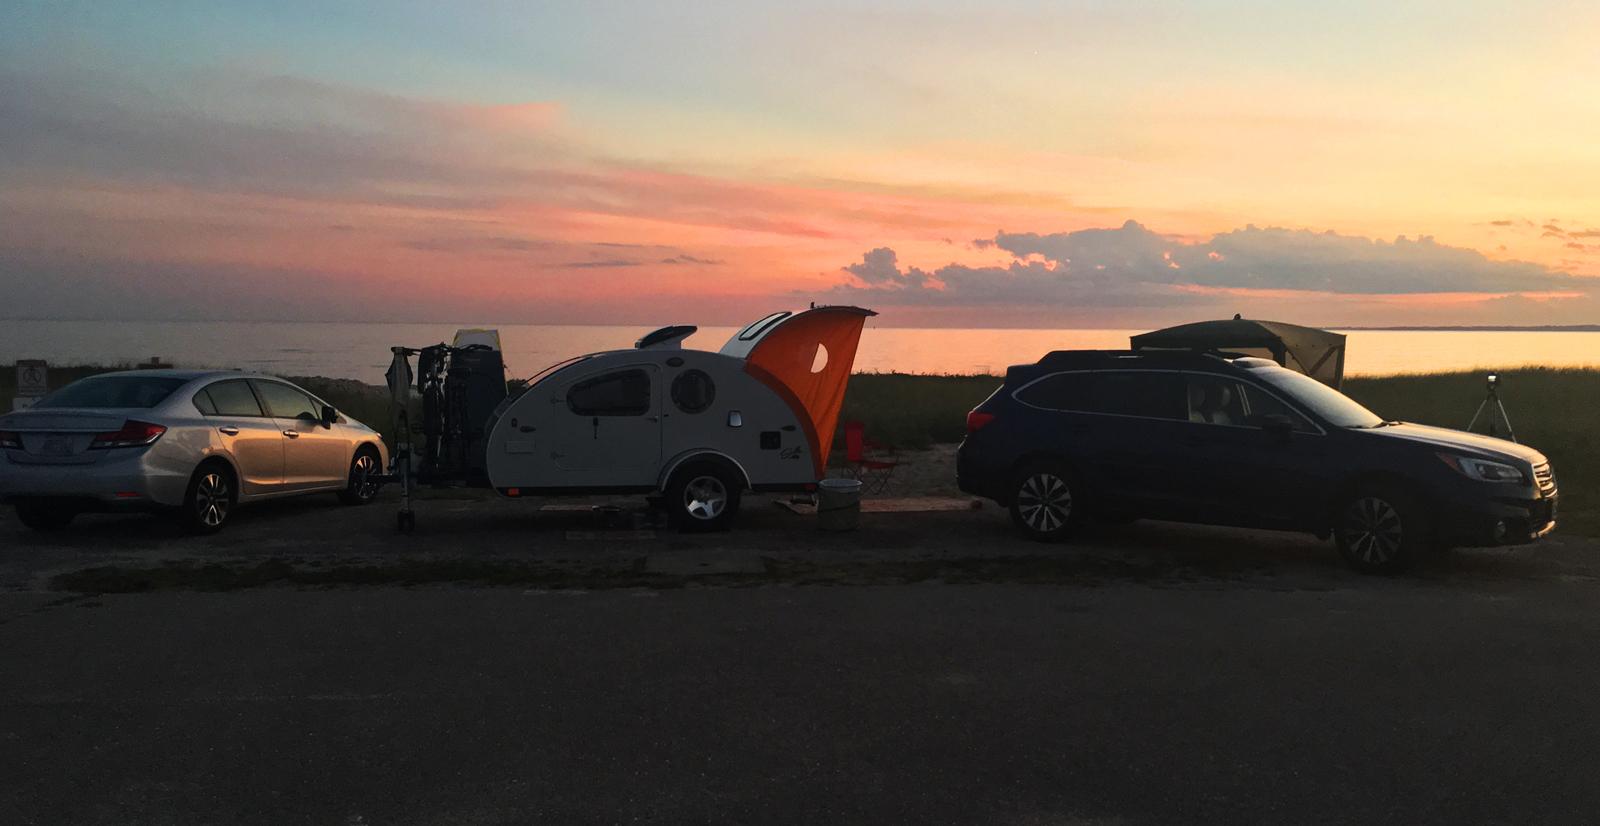 Sunset campsite!